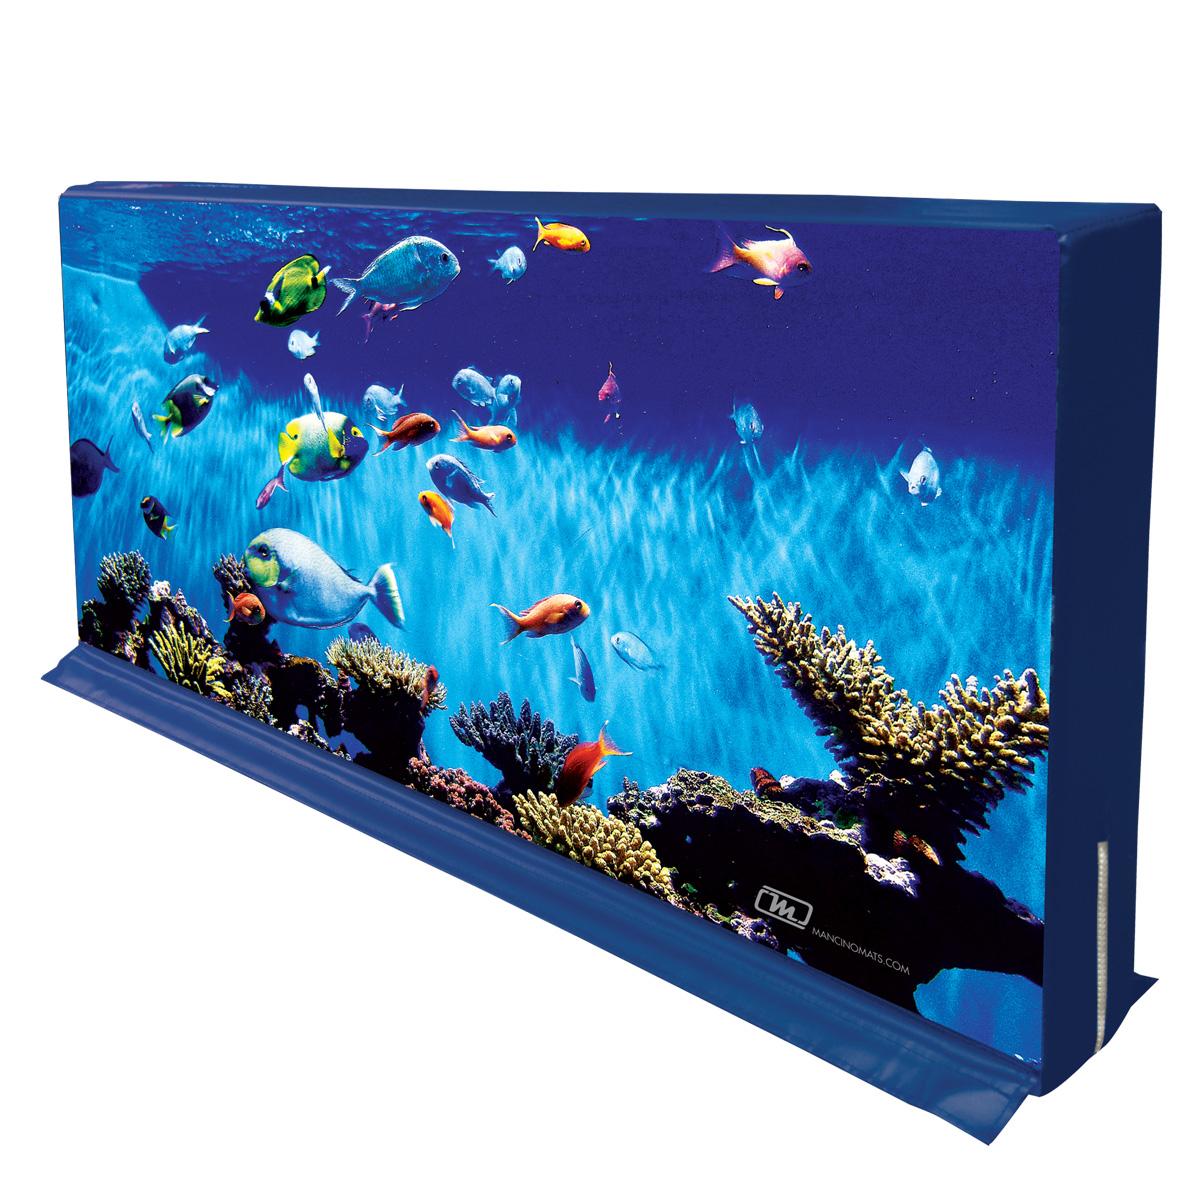 mancino mats underwater aquarium ocean hedge mat barrier